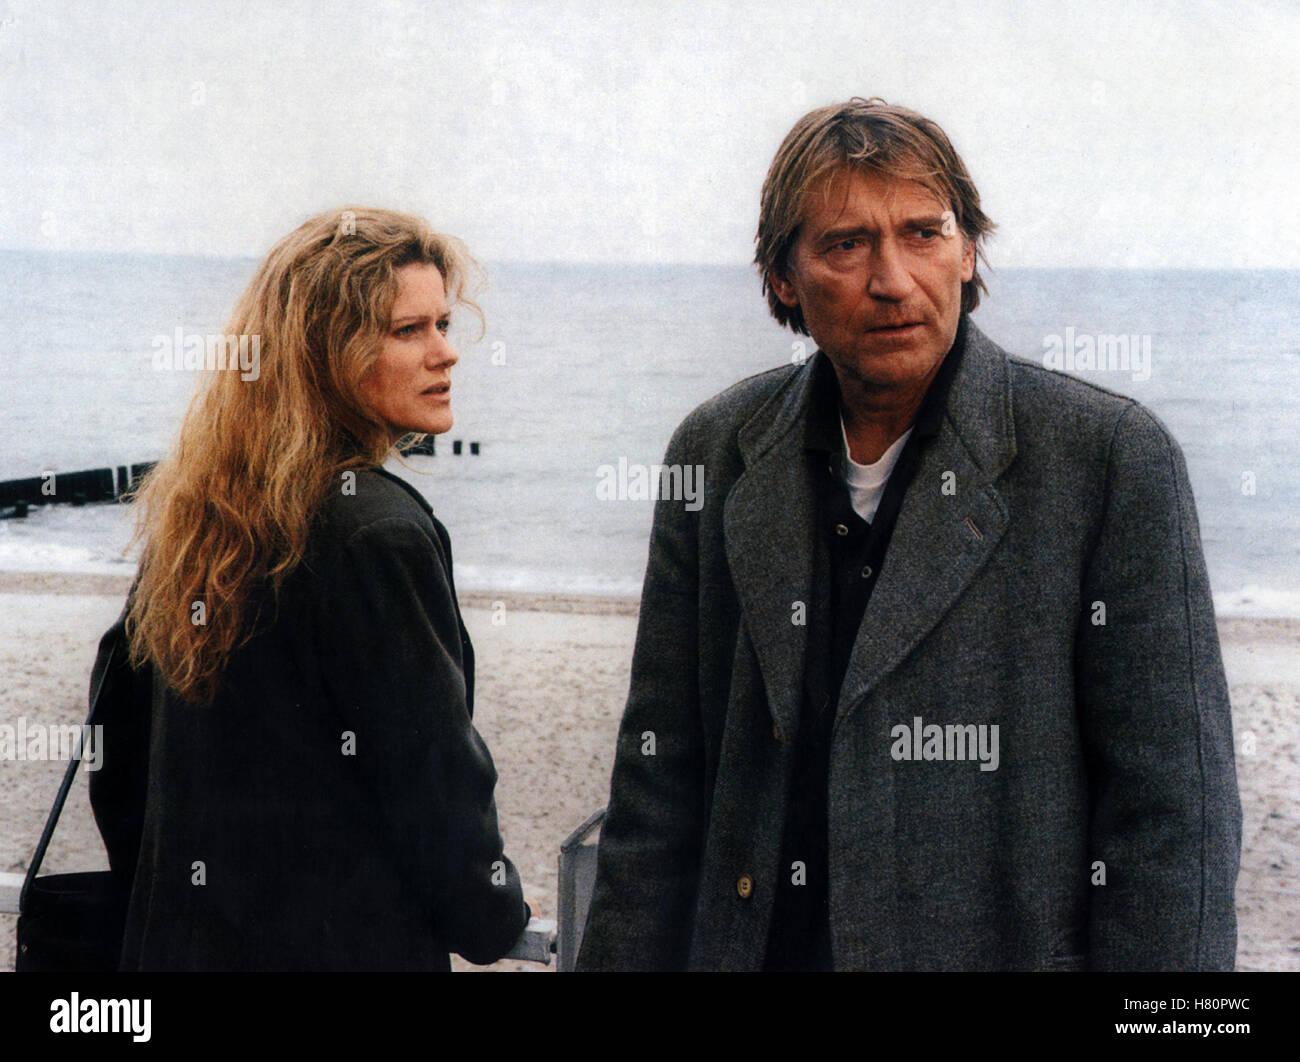 Im Namen der Unschuld, (IM NAMEN DER UNSCHULD) D 1997, Regie: Andreas Kleinert, BARBARA SUKOWA, MATTHIAS HABICH - Stock Image